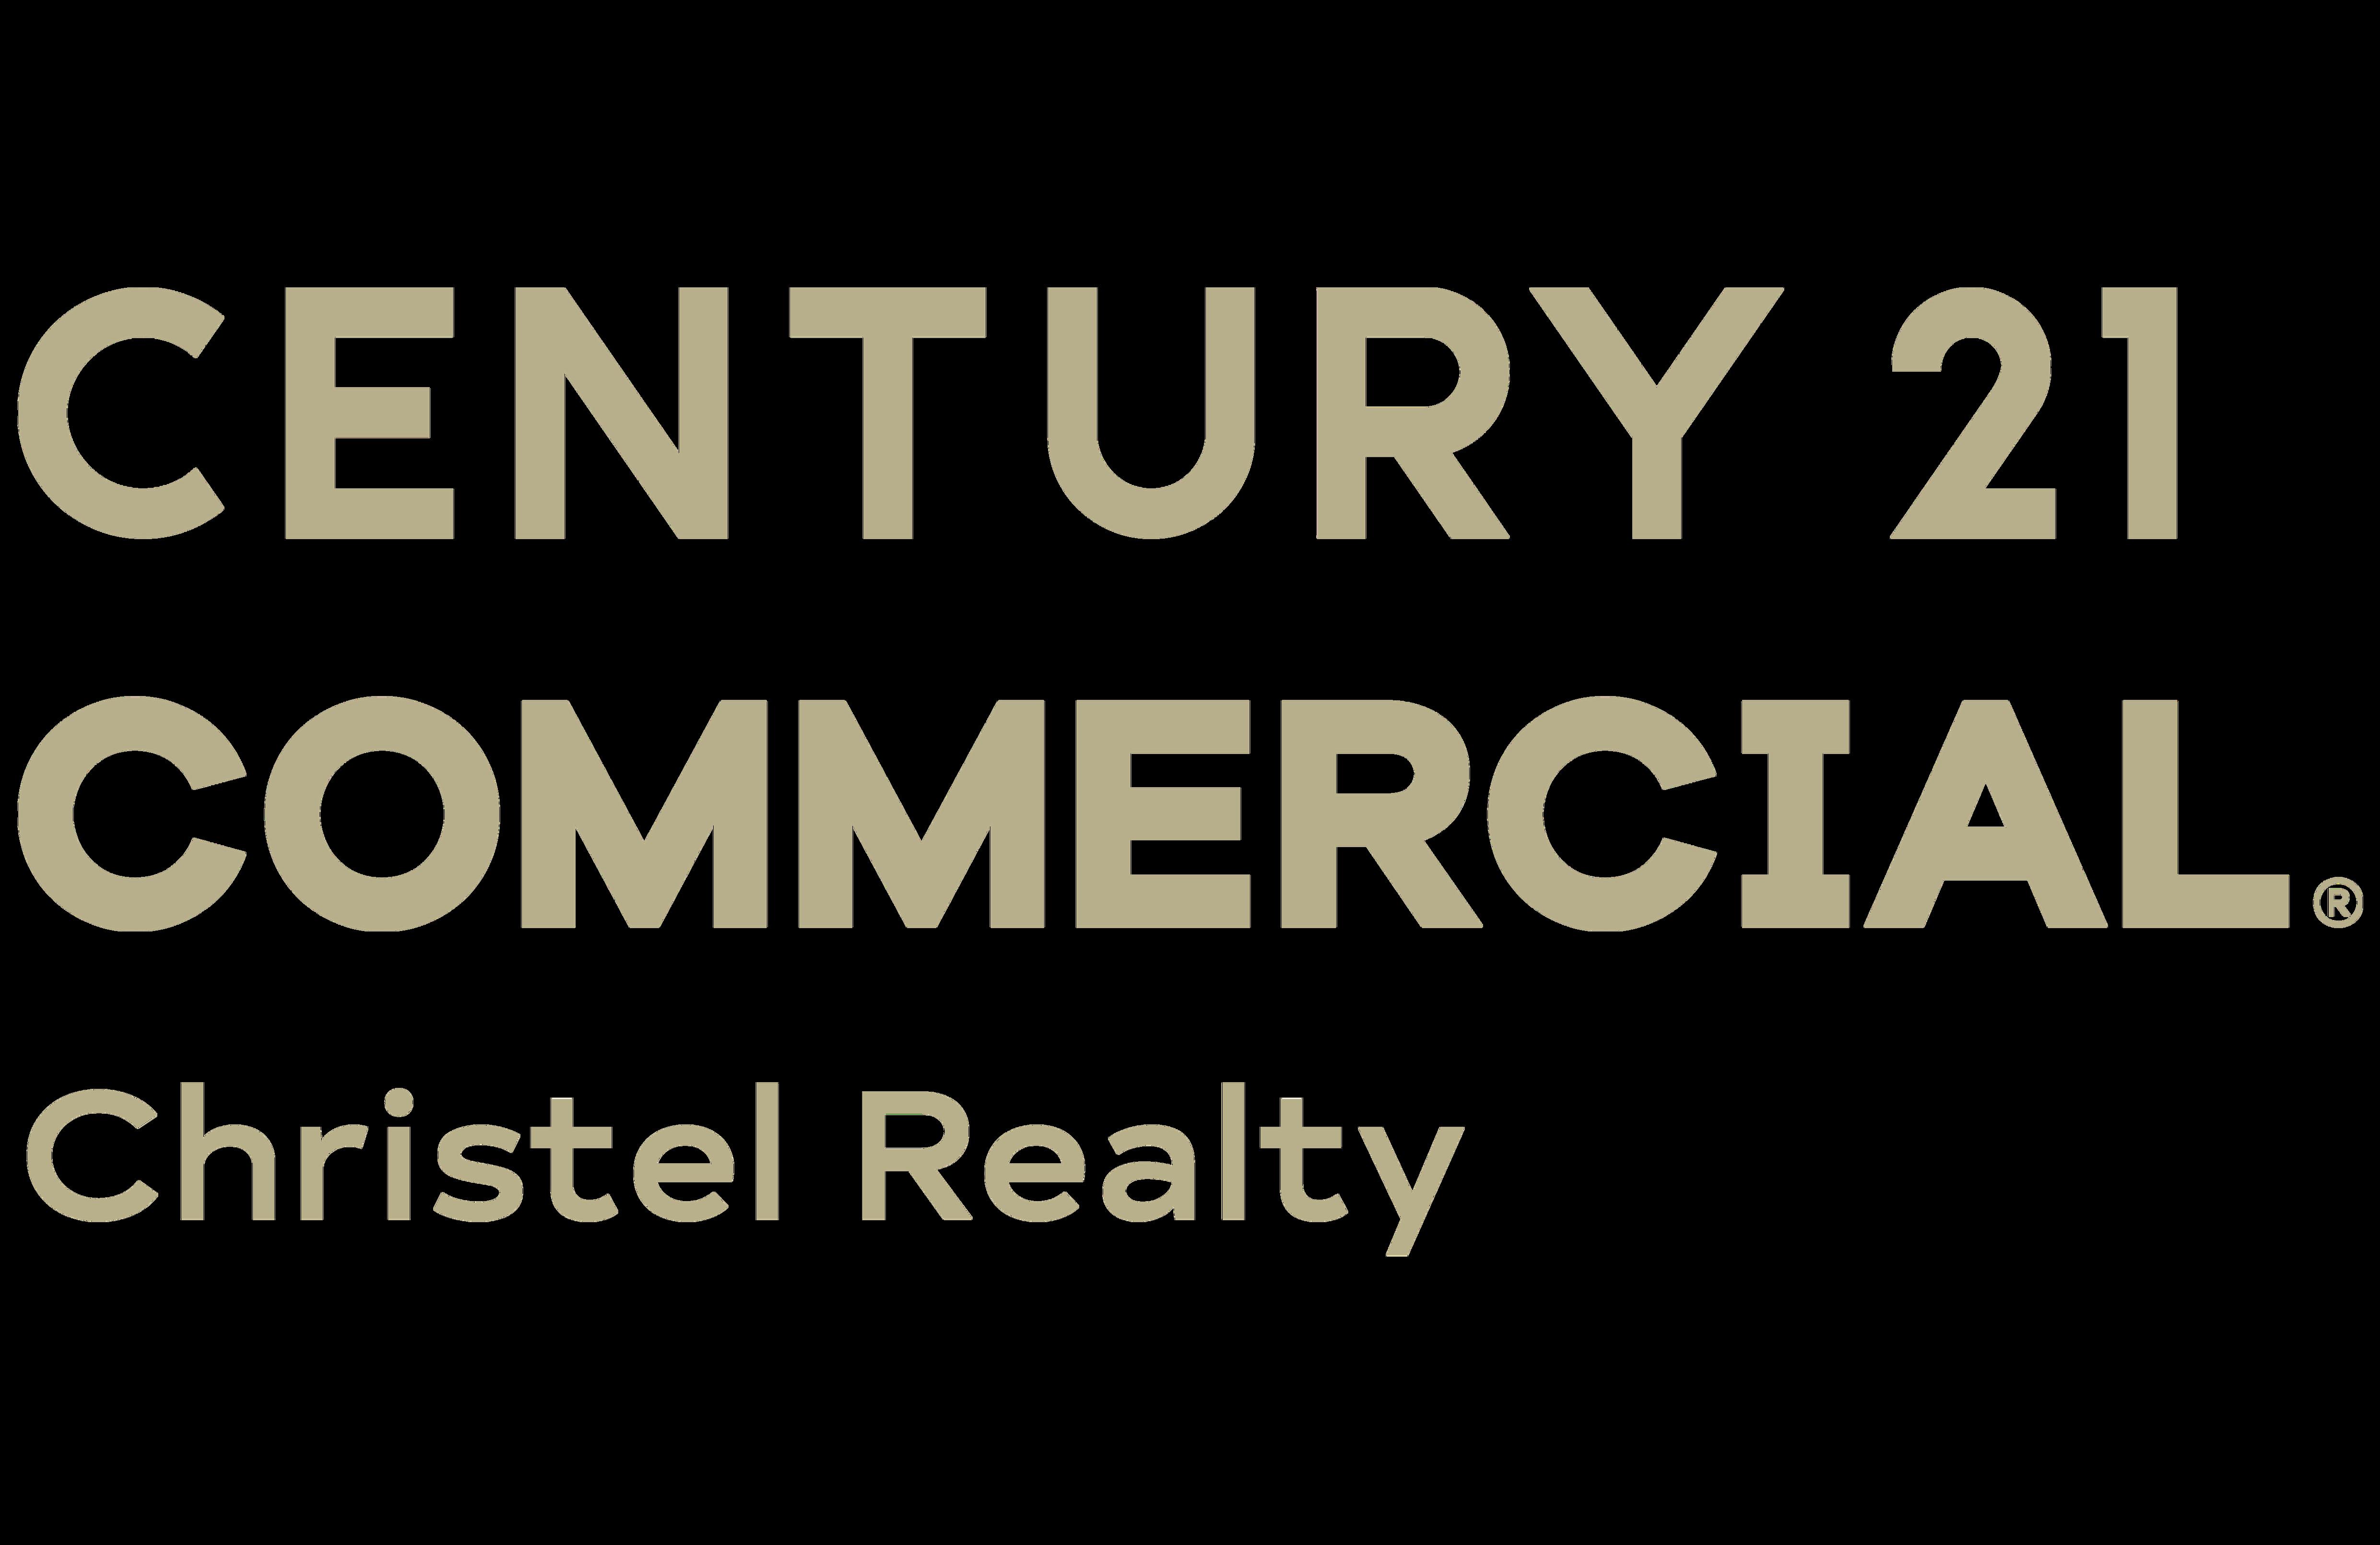 Peter Skolsky of CENTURY 21 Christel Realty logo